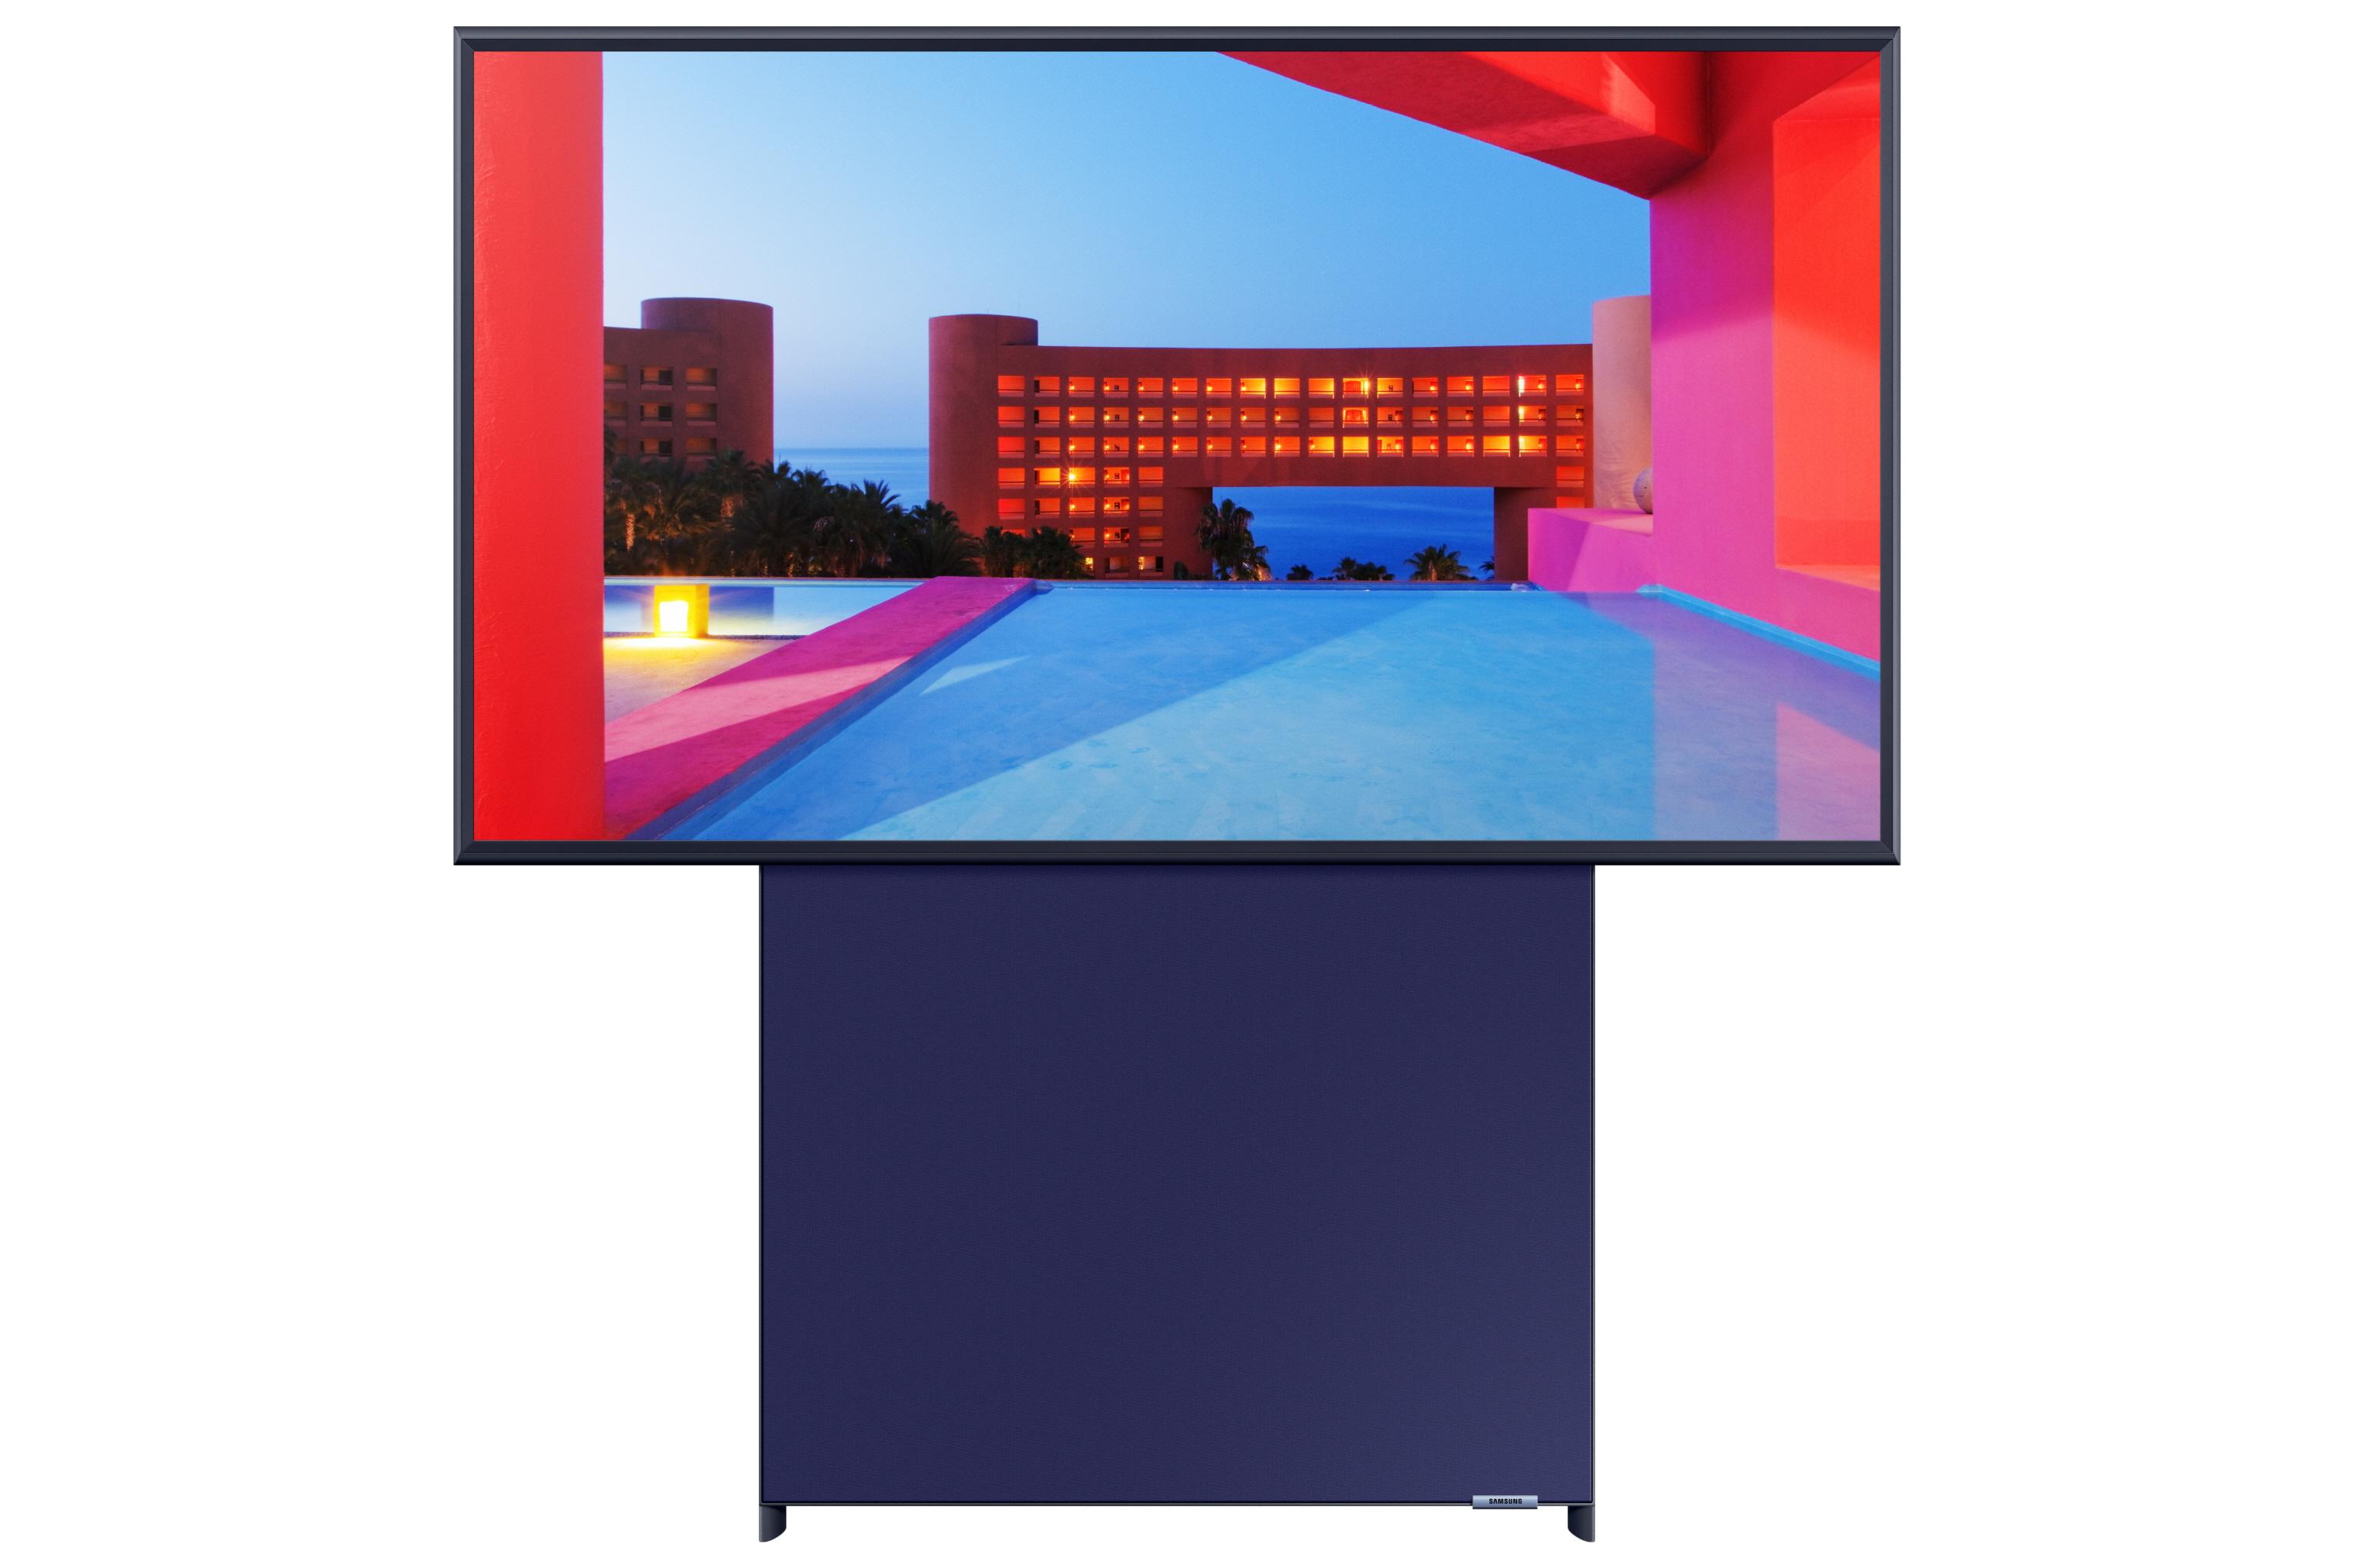 The Sero, Samsung Lifestyle TV